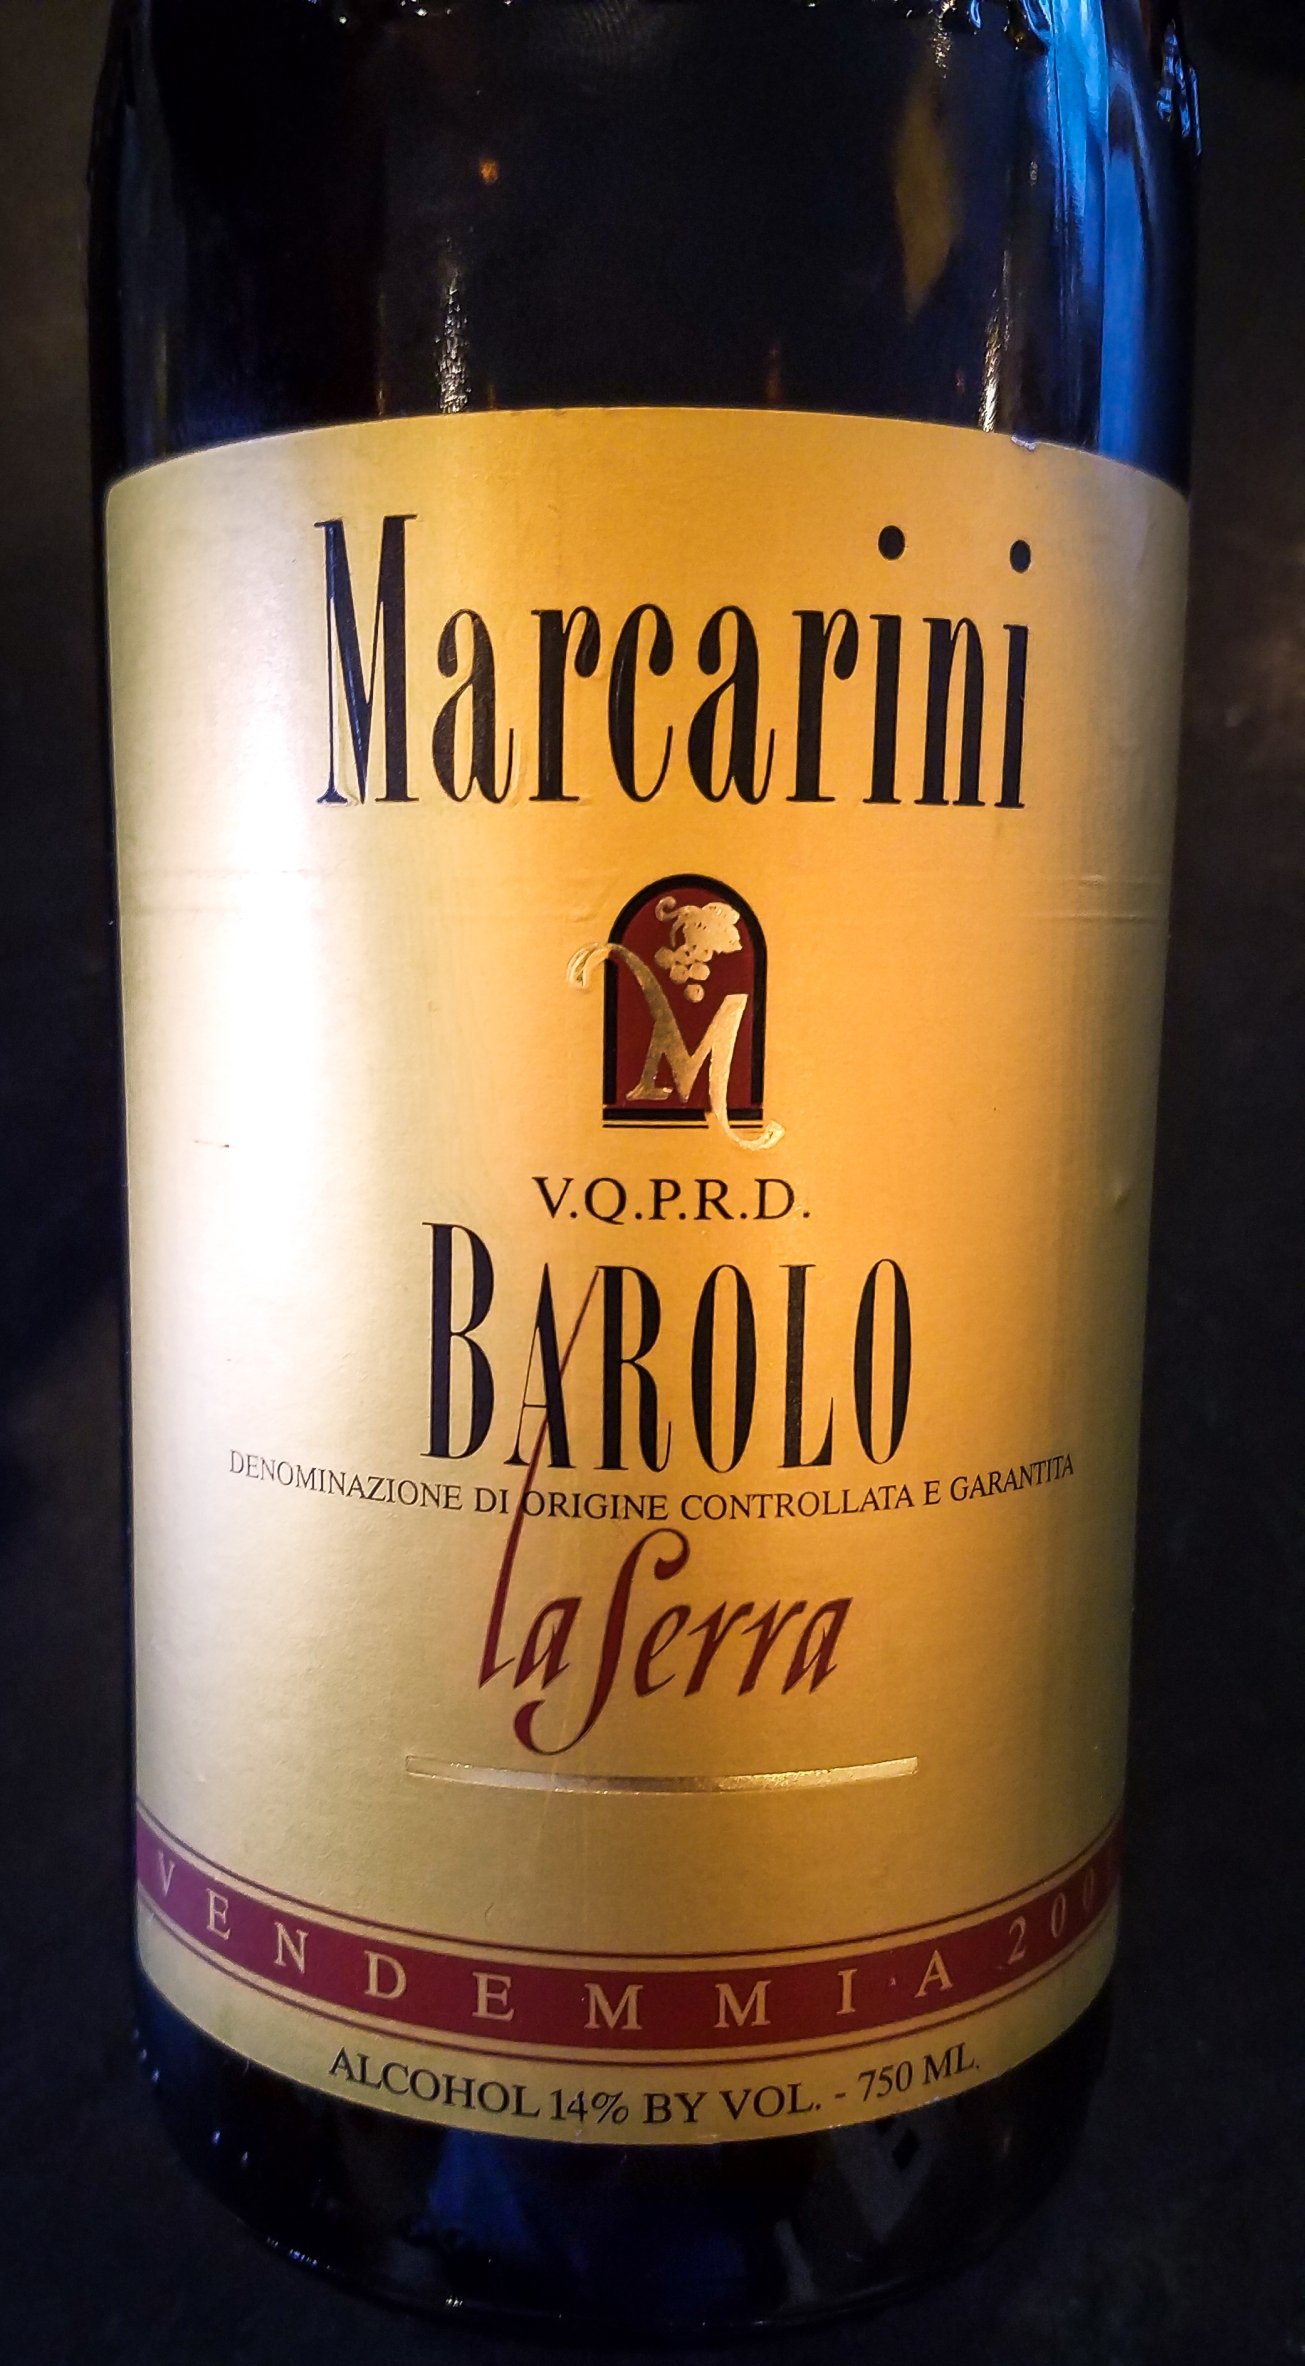 2001 Marcarini Barolo La Serra